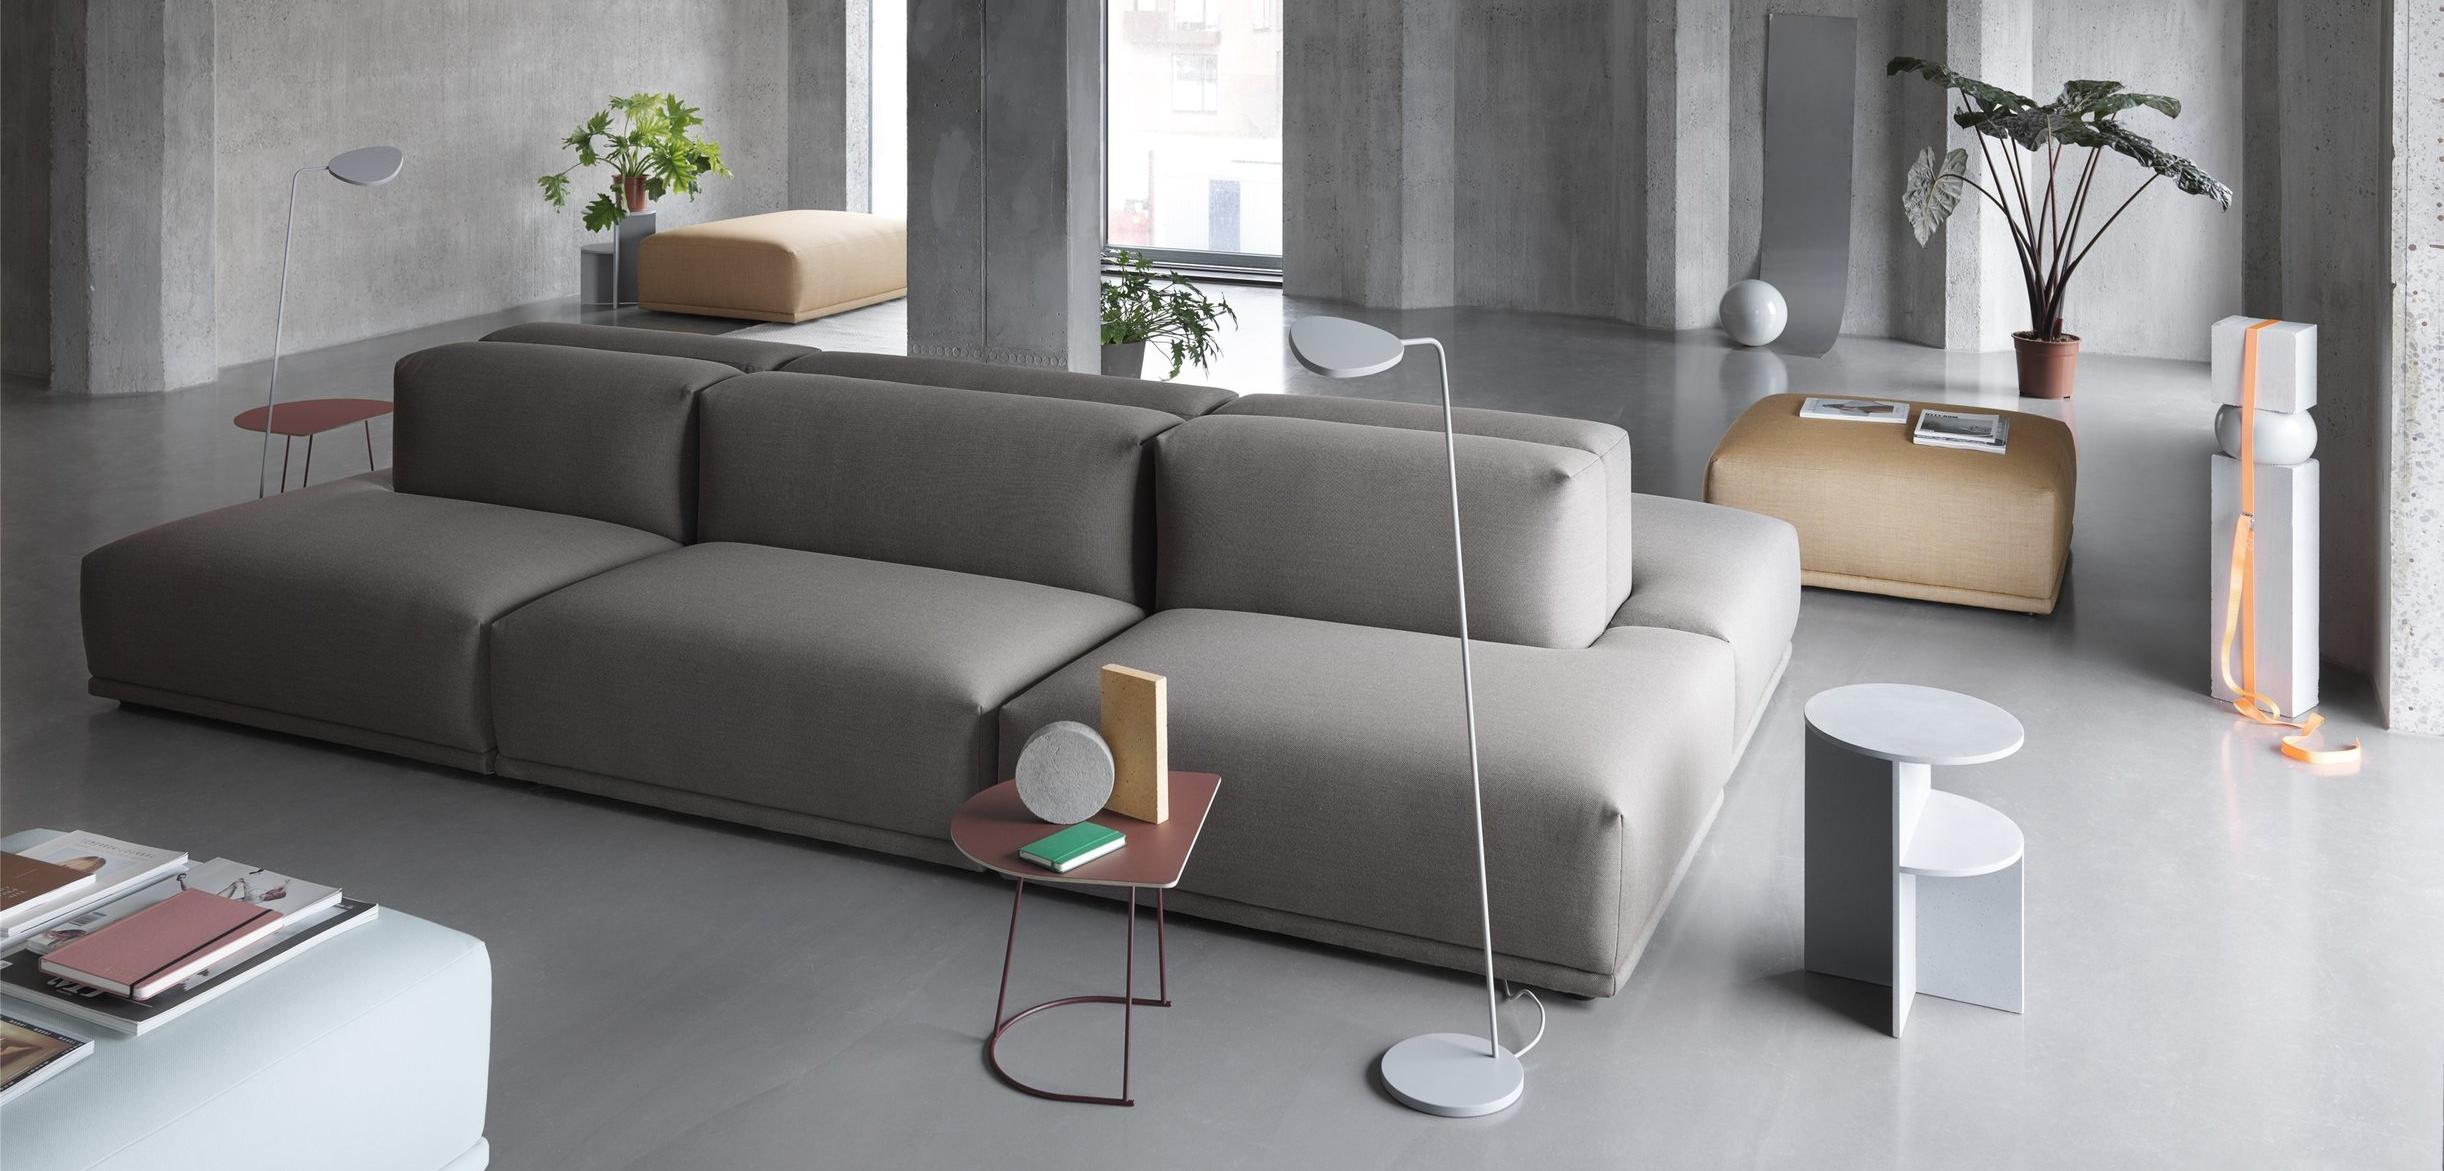 Connect-Leaf-floor-lamp-Airy-halfsize-plum-Halves-org_(150).jpg